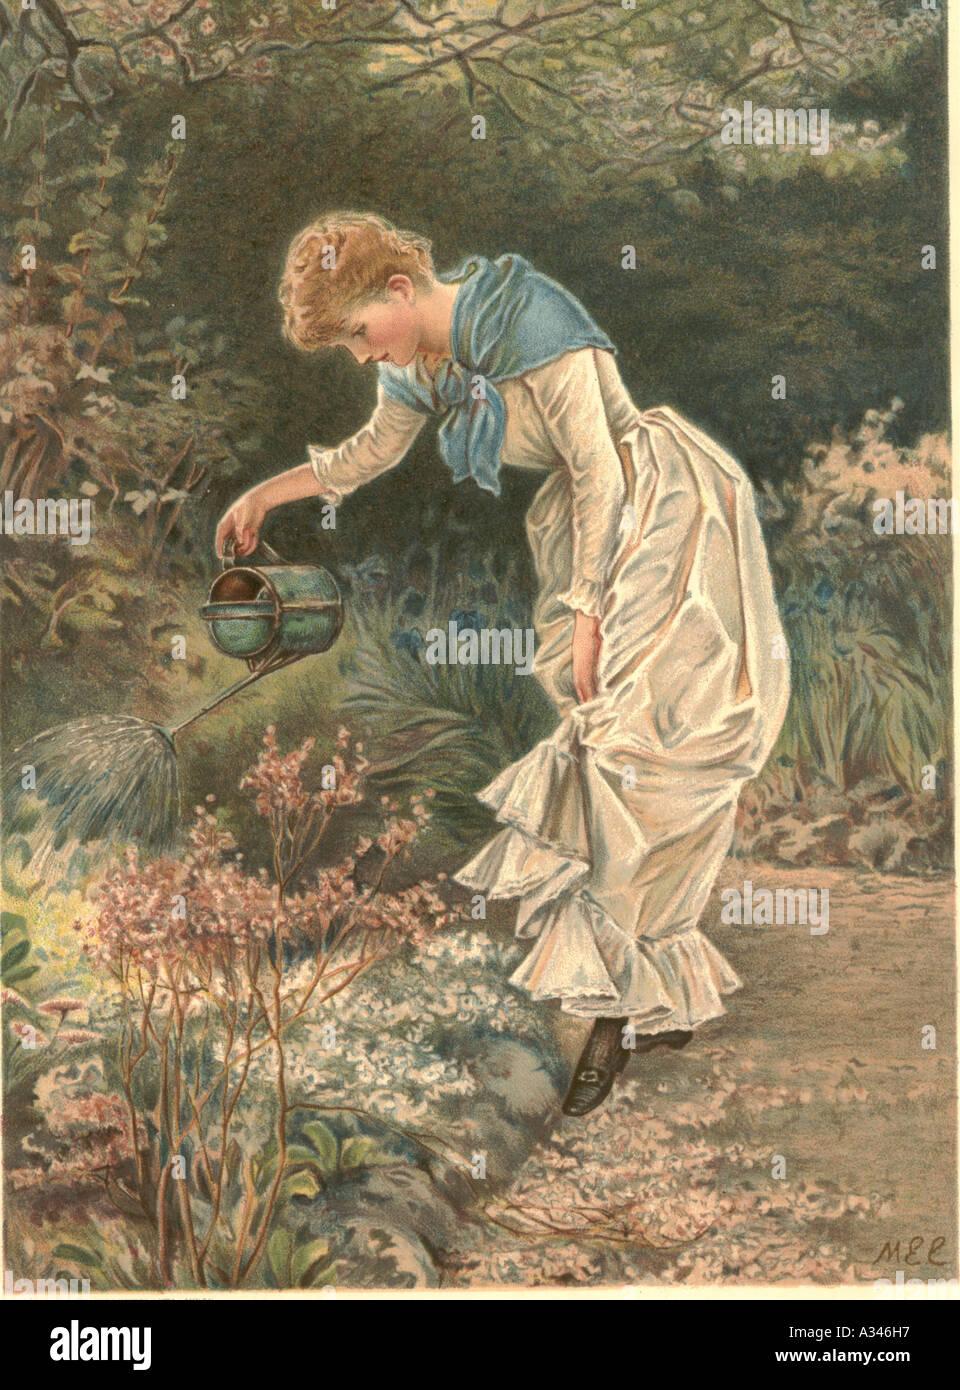 Gardener Illustration Stock Photos & Gardener Illustration Stock ...